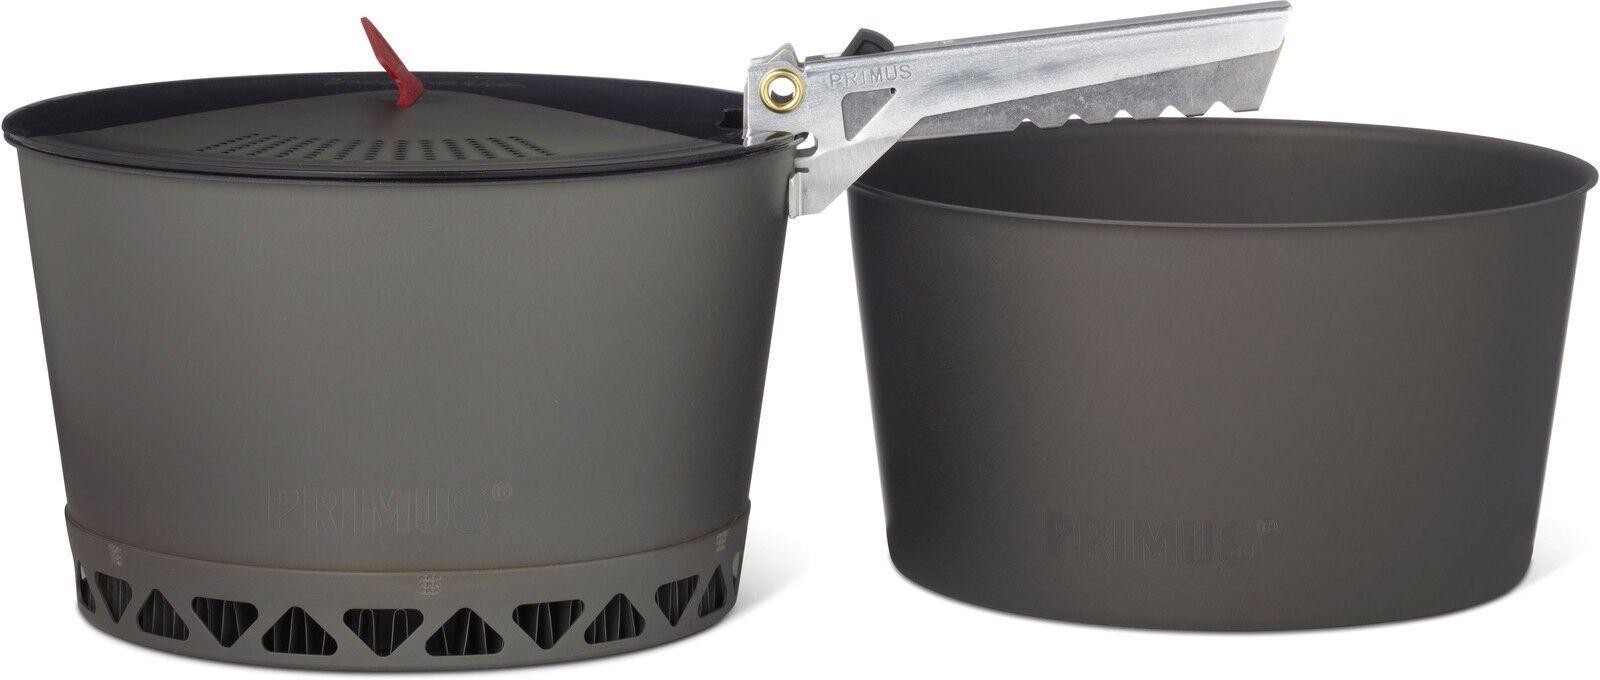 PRIMUS PrimeTech Pot Set 2.3L Campingkochtopf-Set P740390